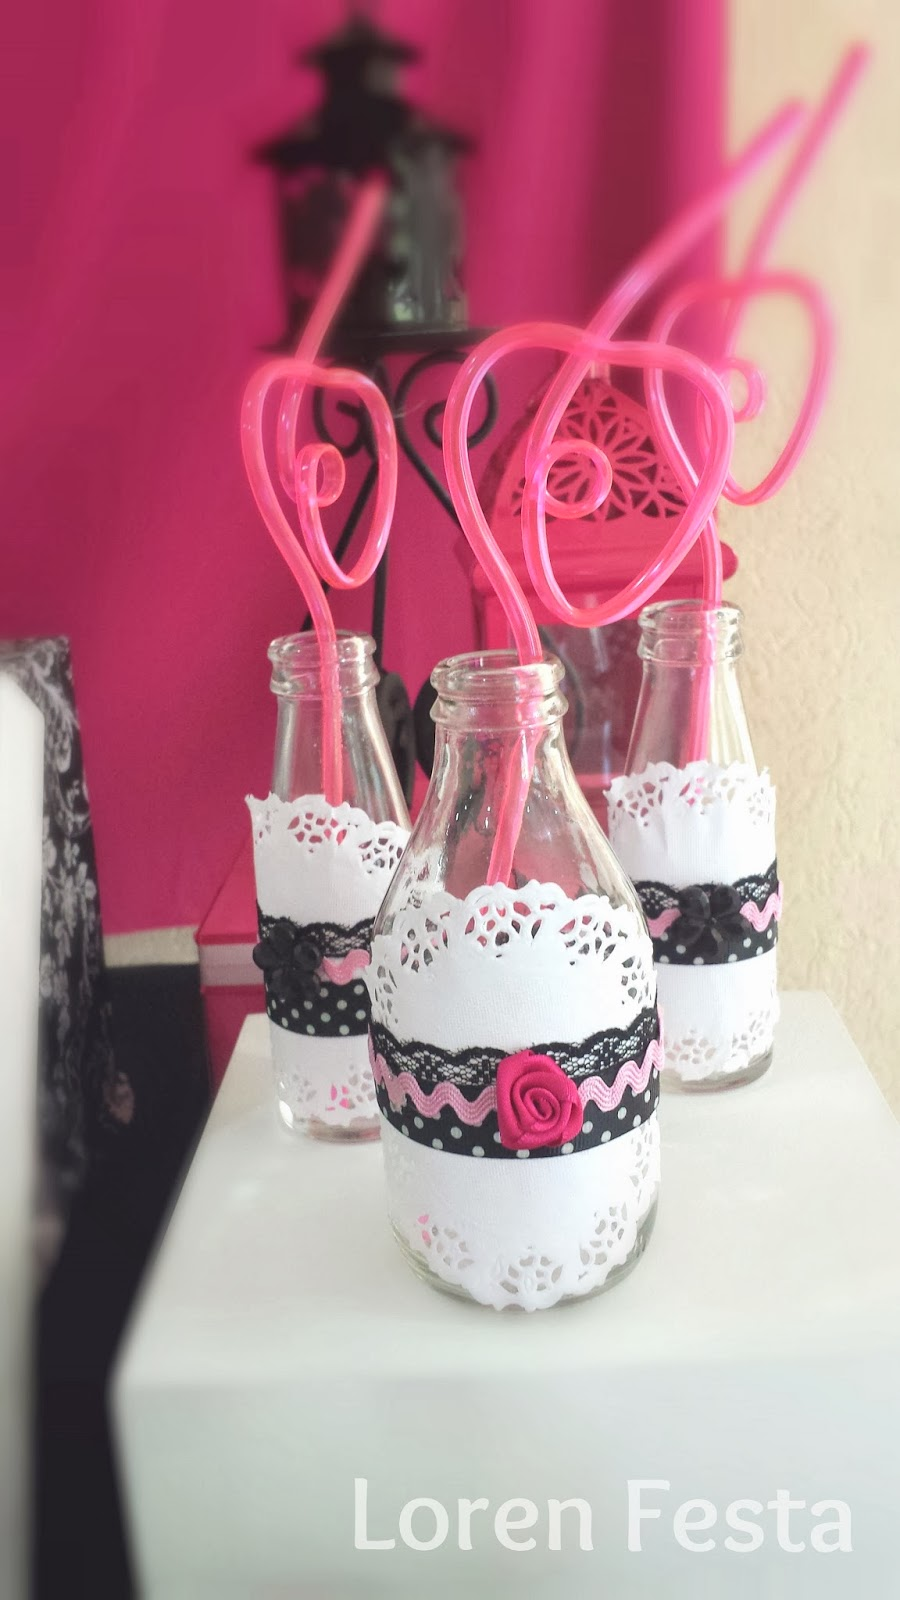 Excepcional Loren Festa : Festa Paris - Festa Pink e Preto - Loren Festa AS43